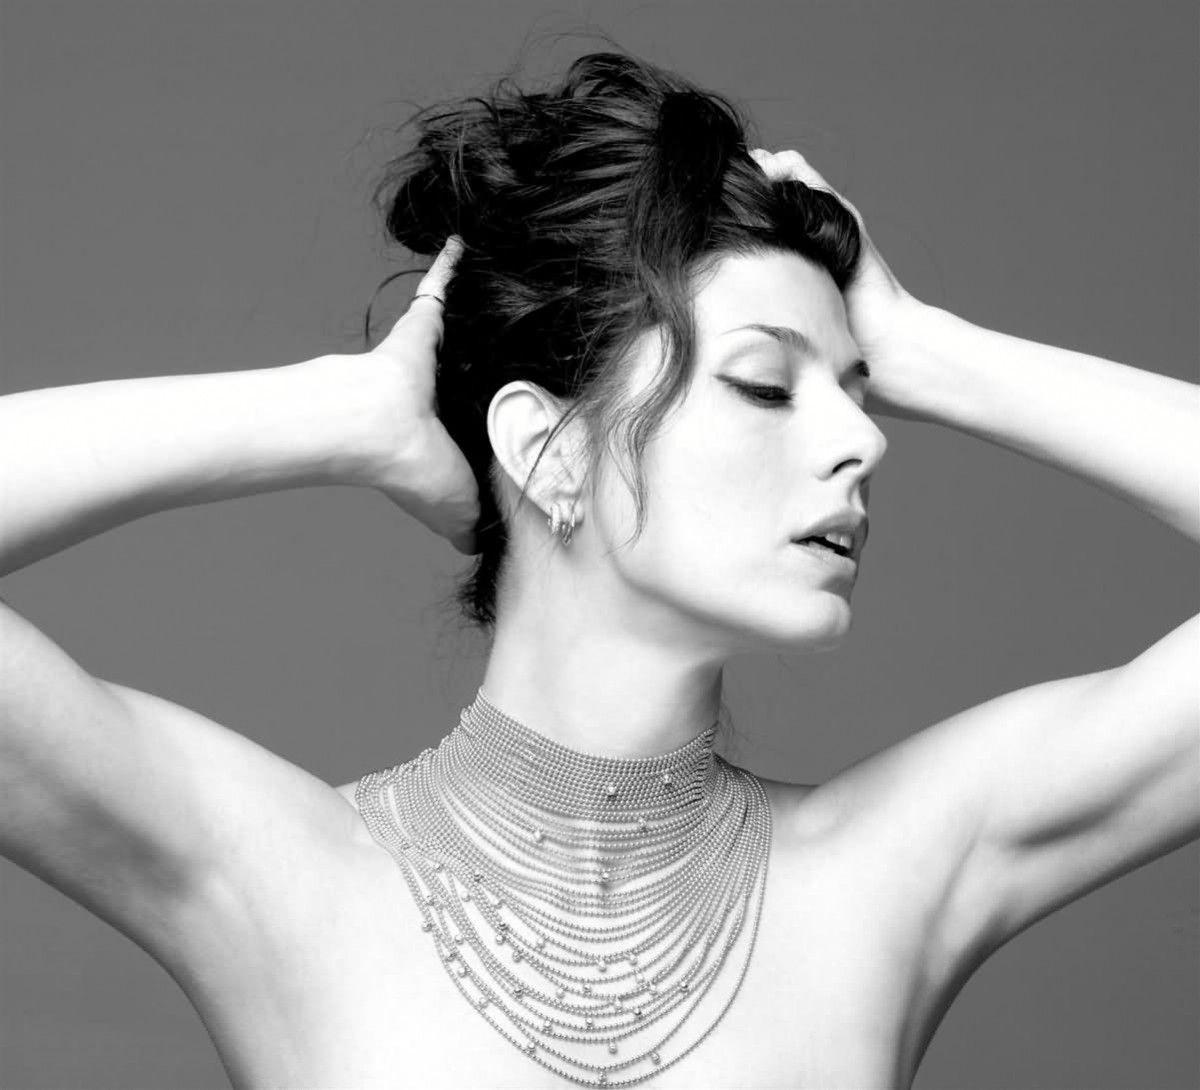 Marisa Tomei photo 36 of 195 pics, wallpaper – photo #157722 – ThePlace2